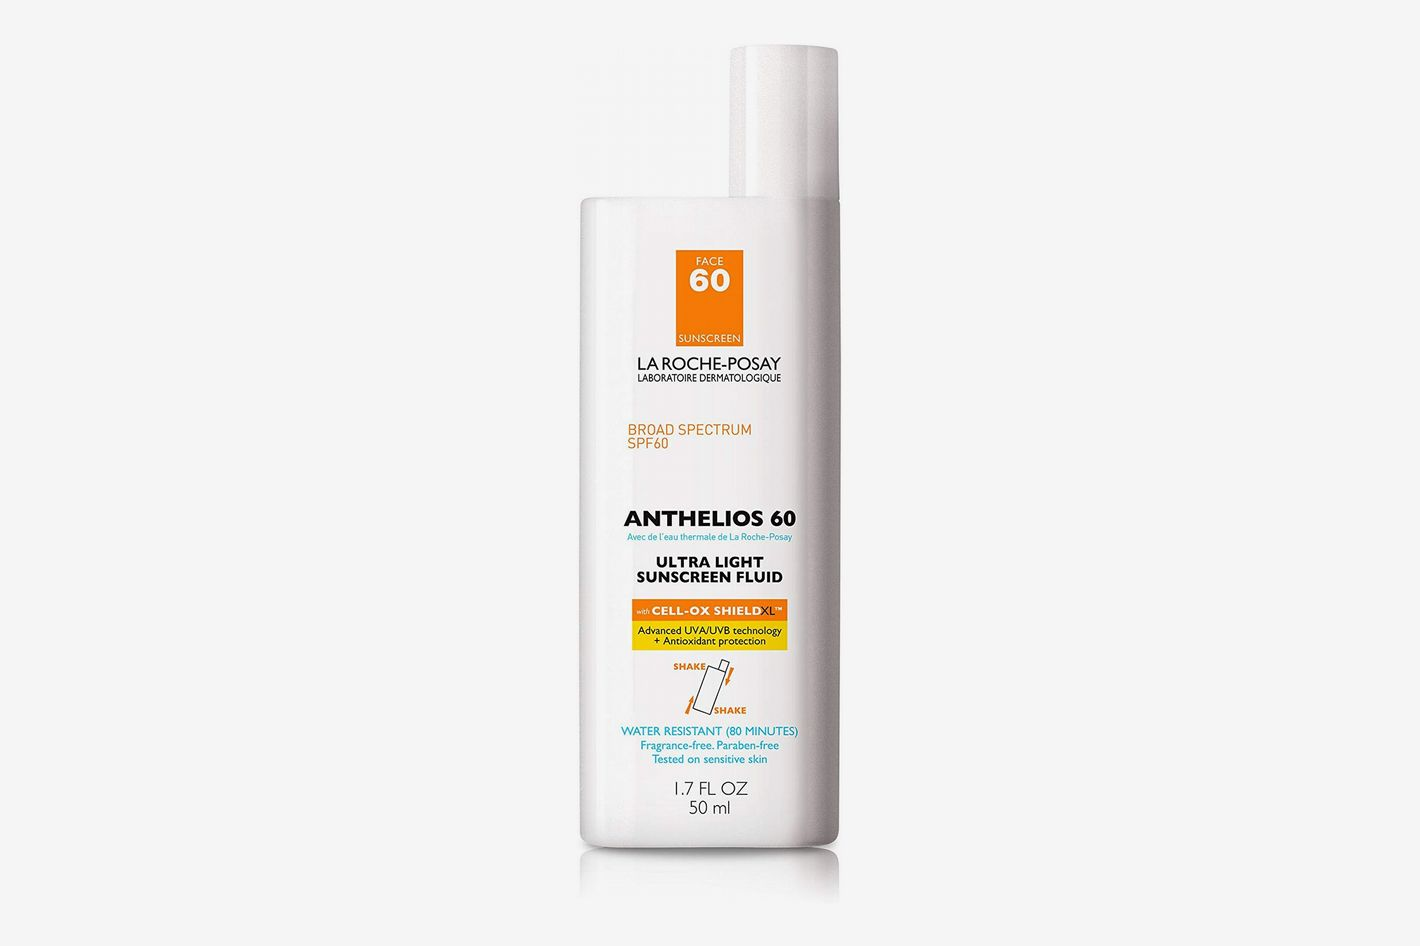 La Roche-Posay Anthelios Ultra Light Sunscreen Fluid SPF 60